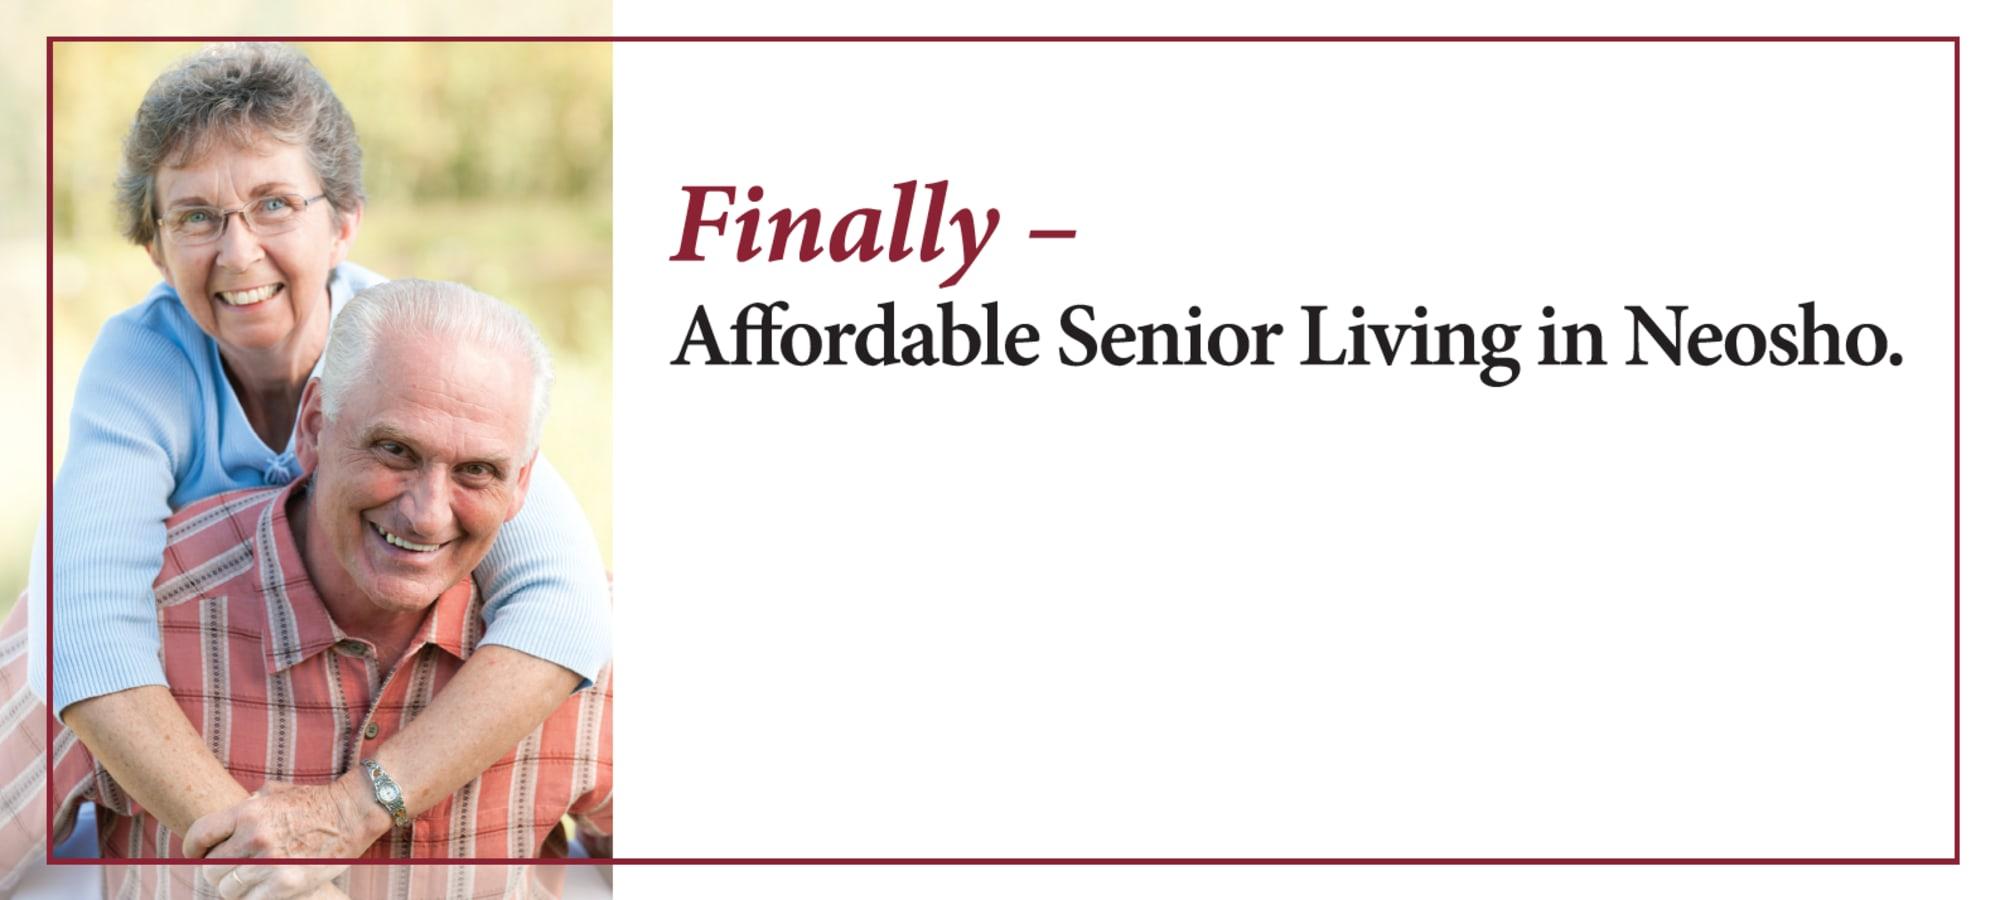 Senior living at Henley Place in Neosho, Missouri